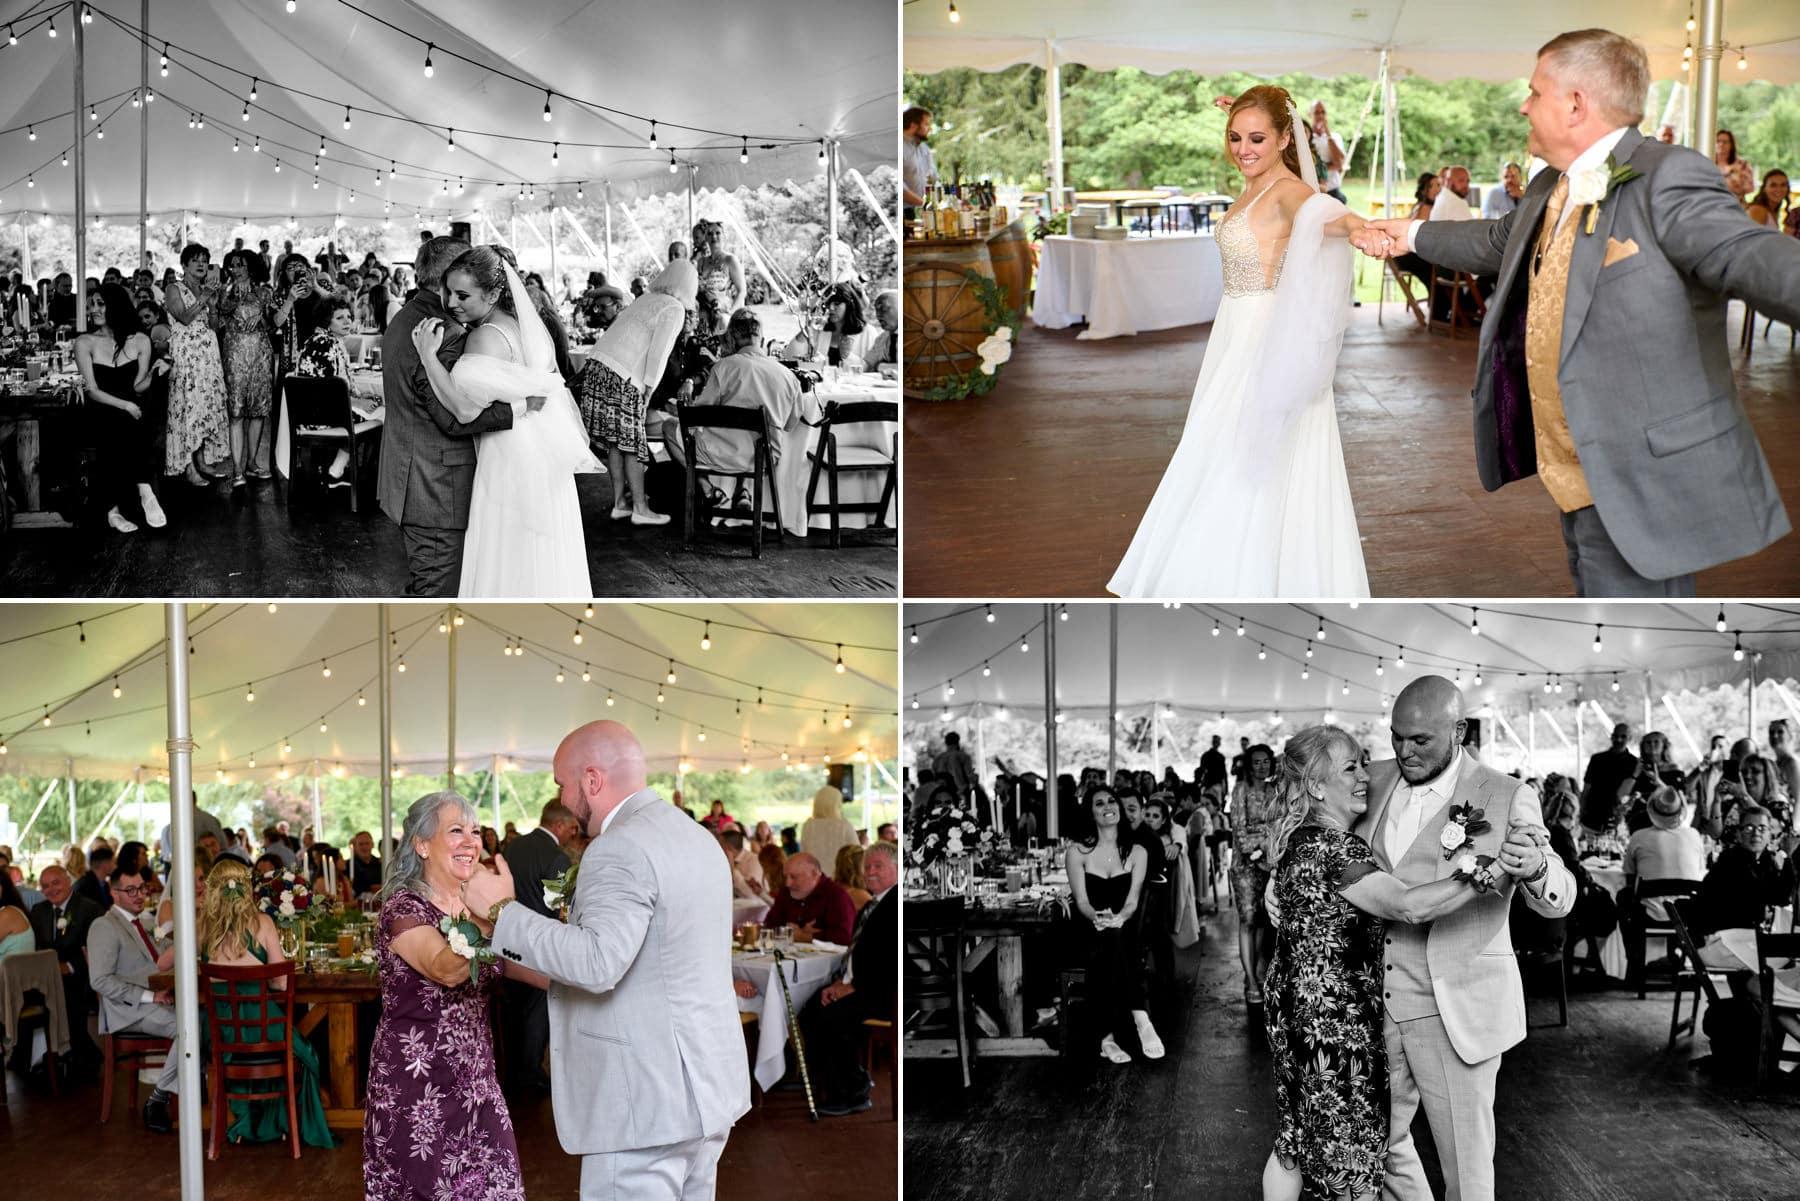 Brick Farm Tavern wedding parent dance photos